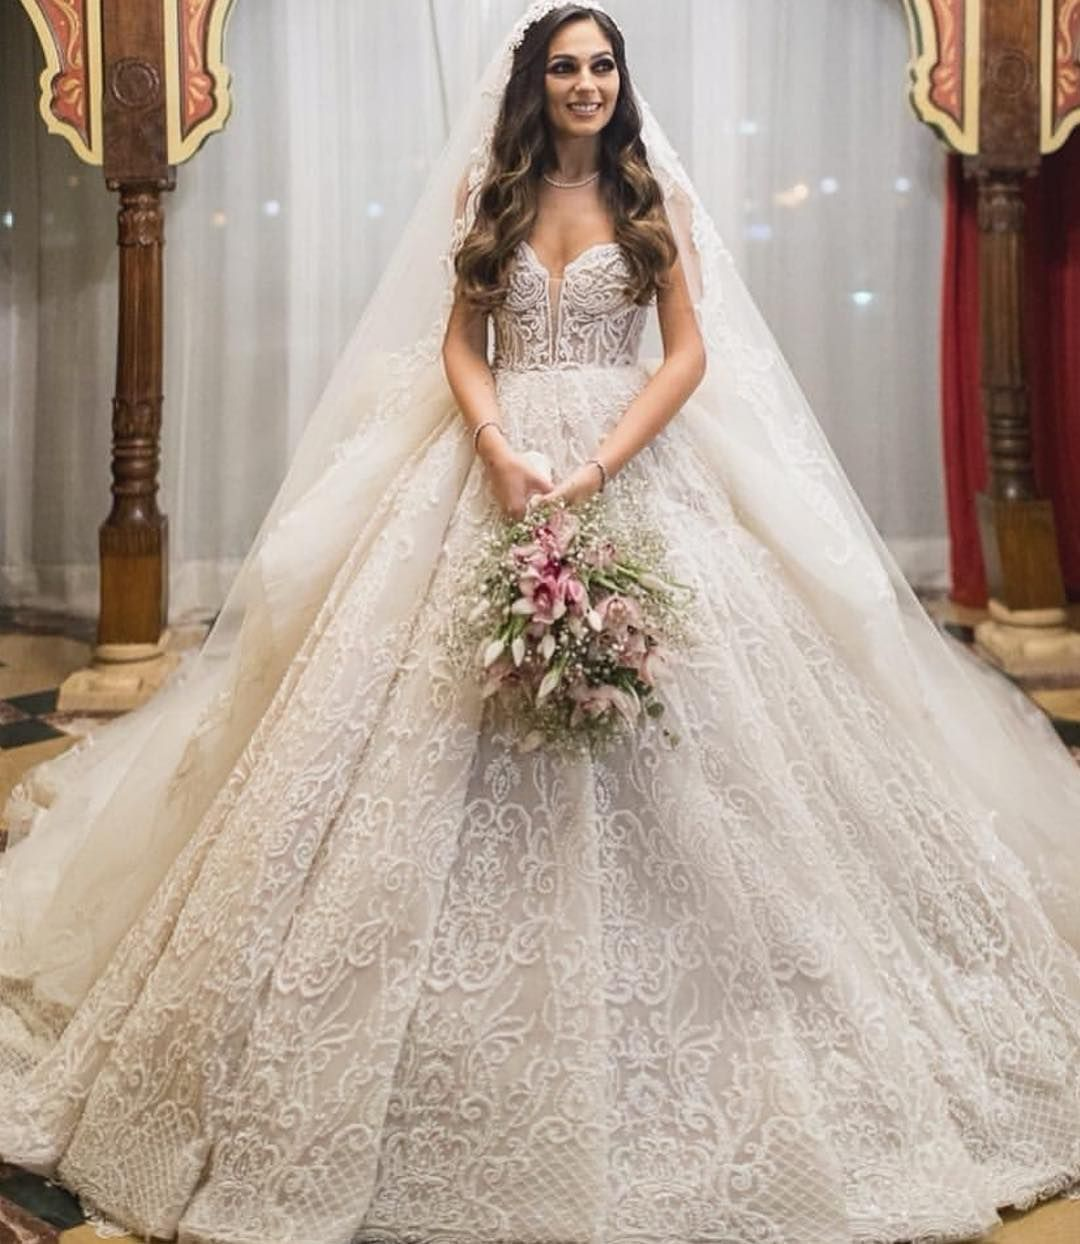 Custom Wedding Dresses And Bespoke Bridal Attire Wedding Dresses Sweetheart Neckline Lavender Bridesmaid Dresses Wedding Dresses [ 1244 x 1080 Pixel ]